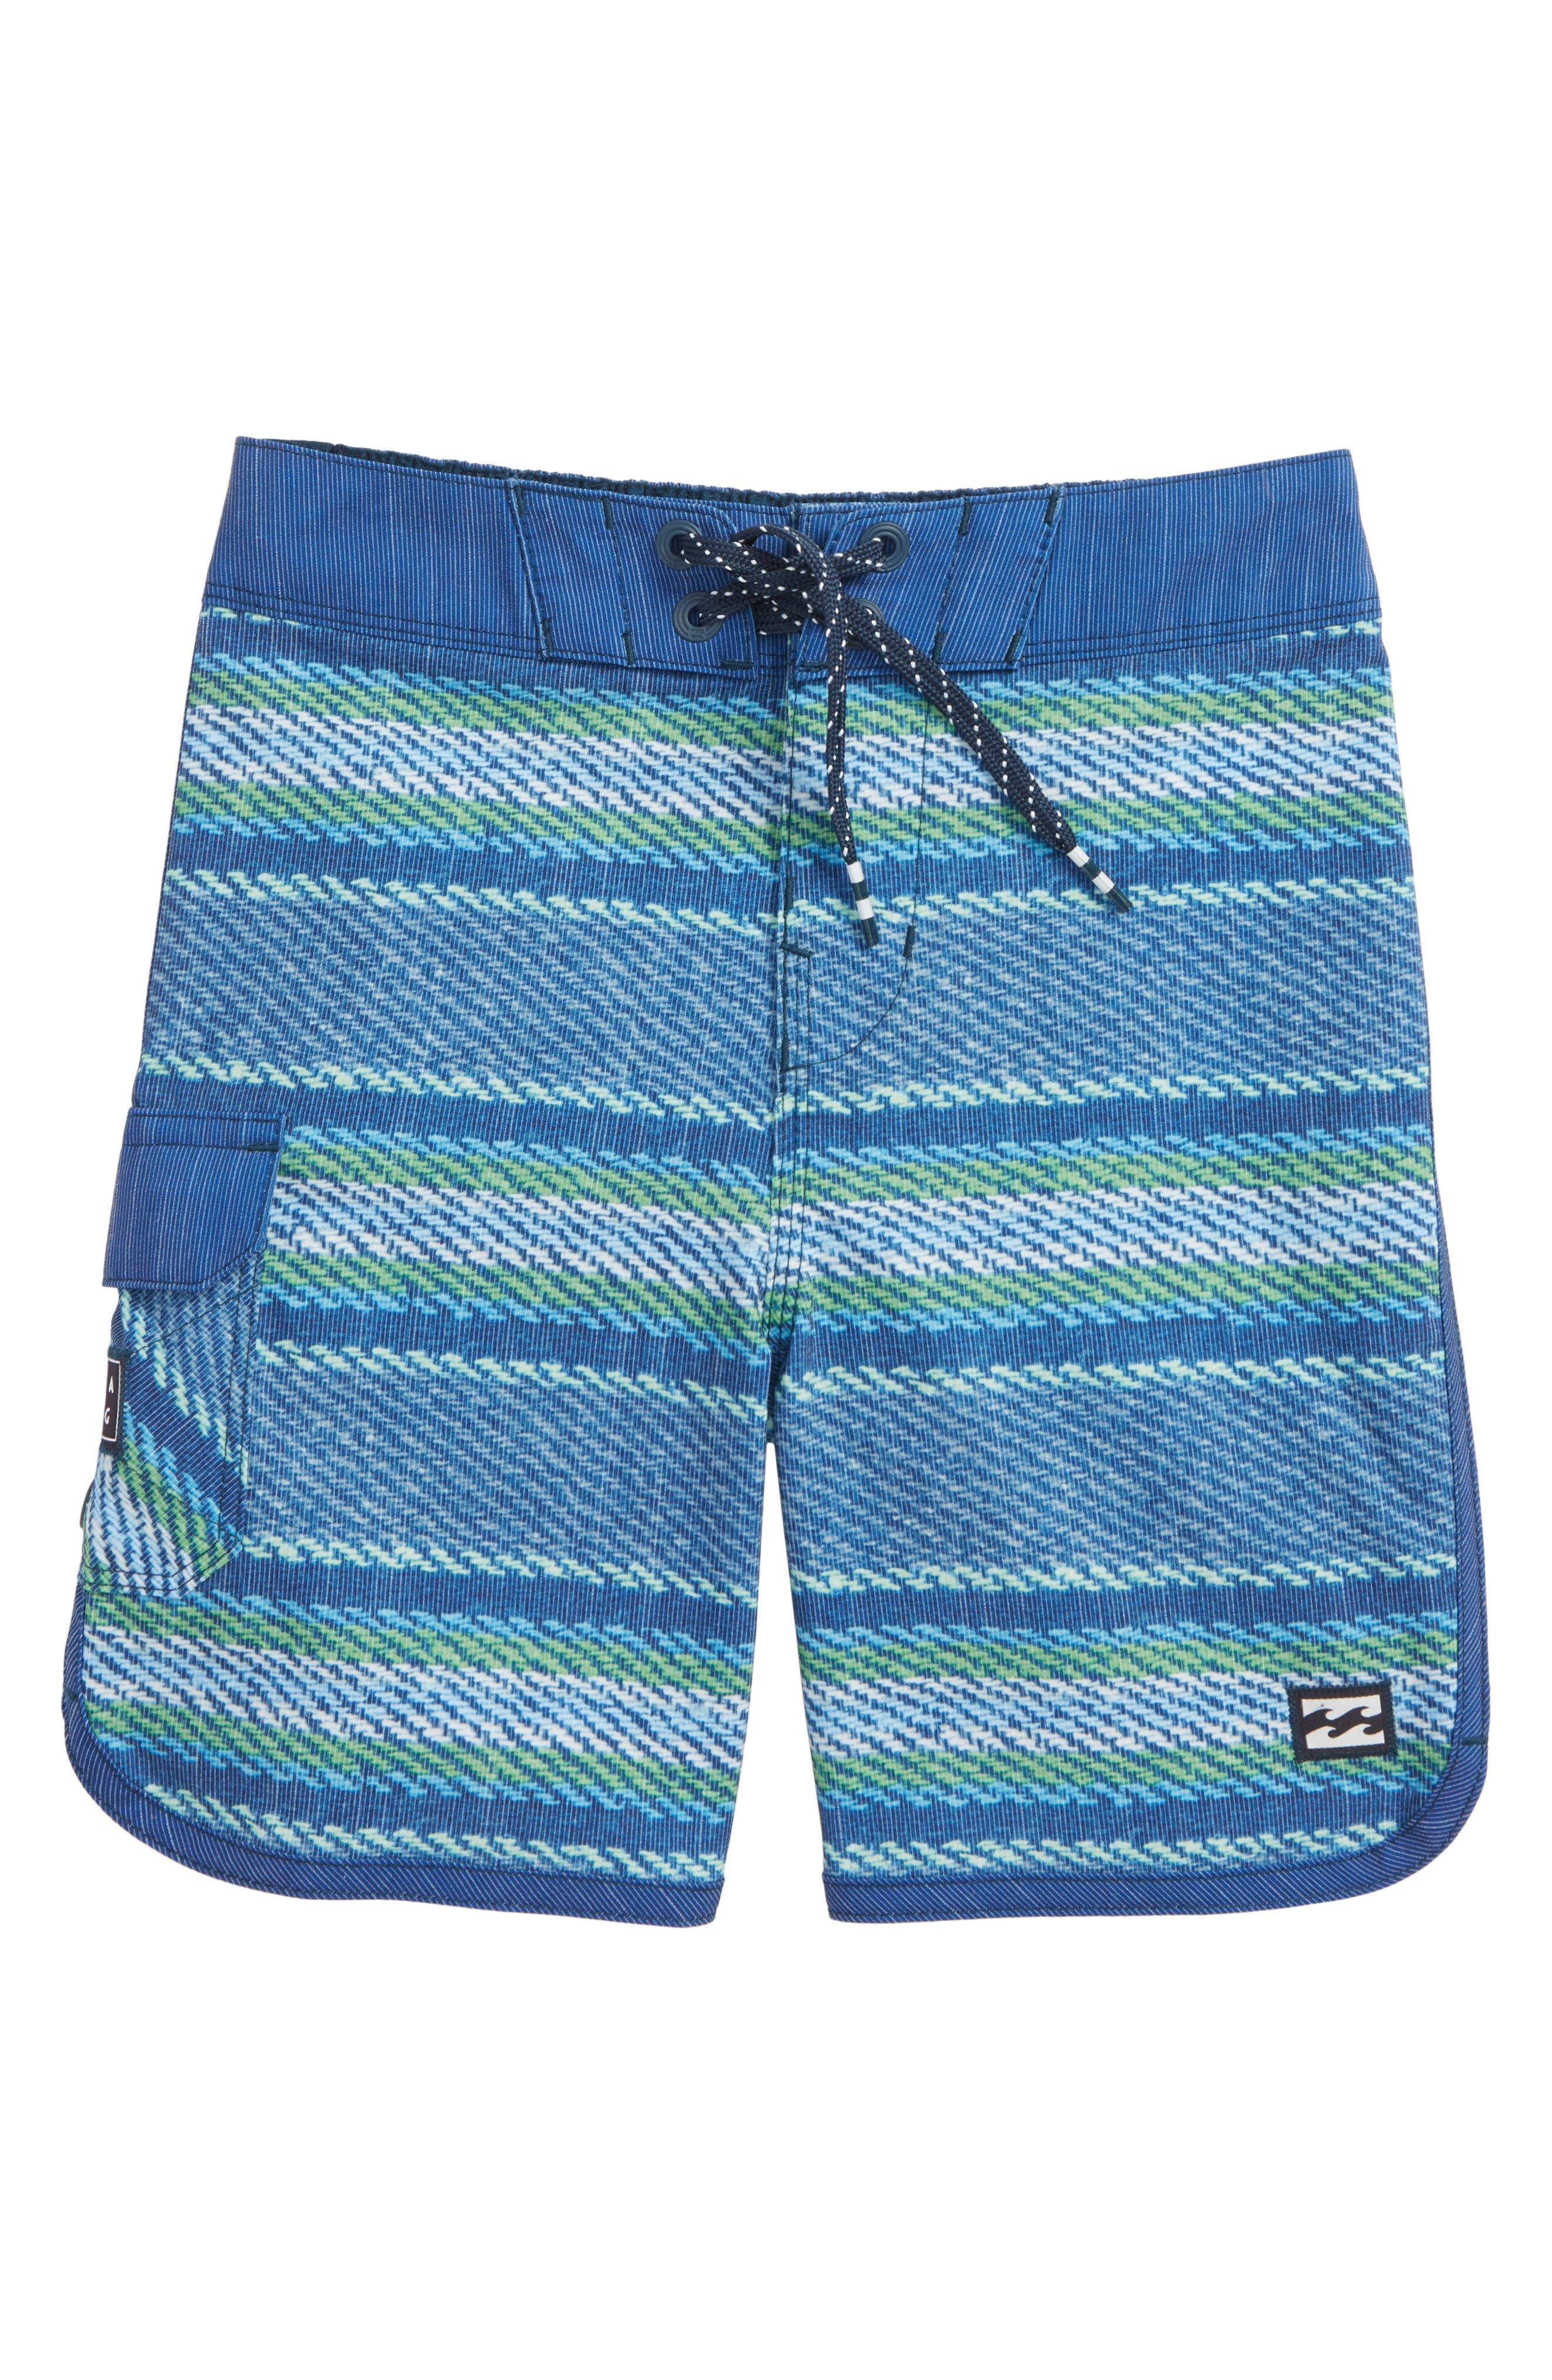 73 LT Lineup Board Shorts,                         Main,                         color, 415